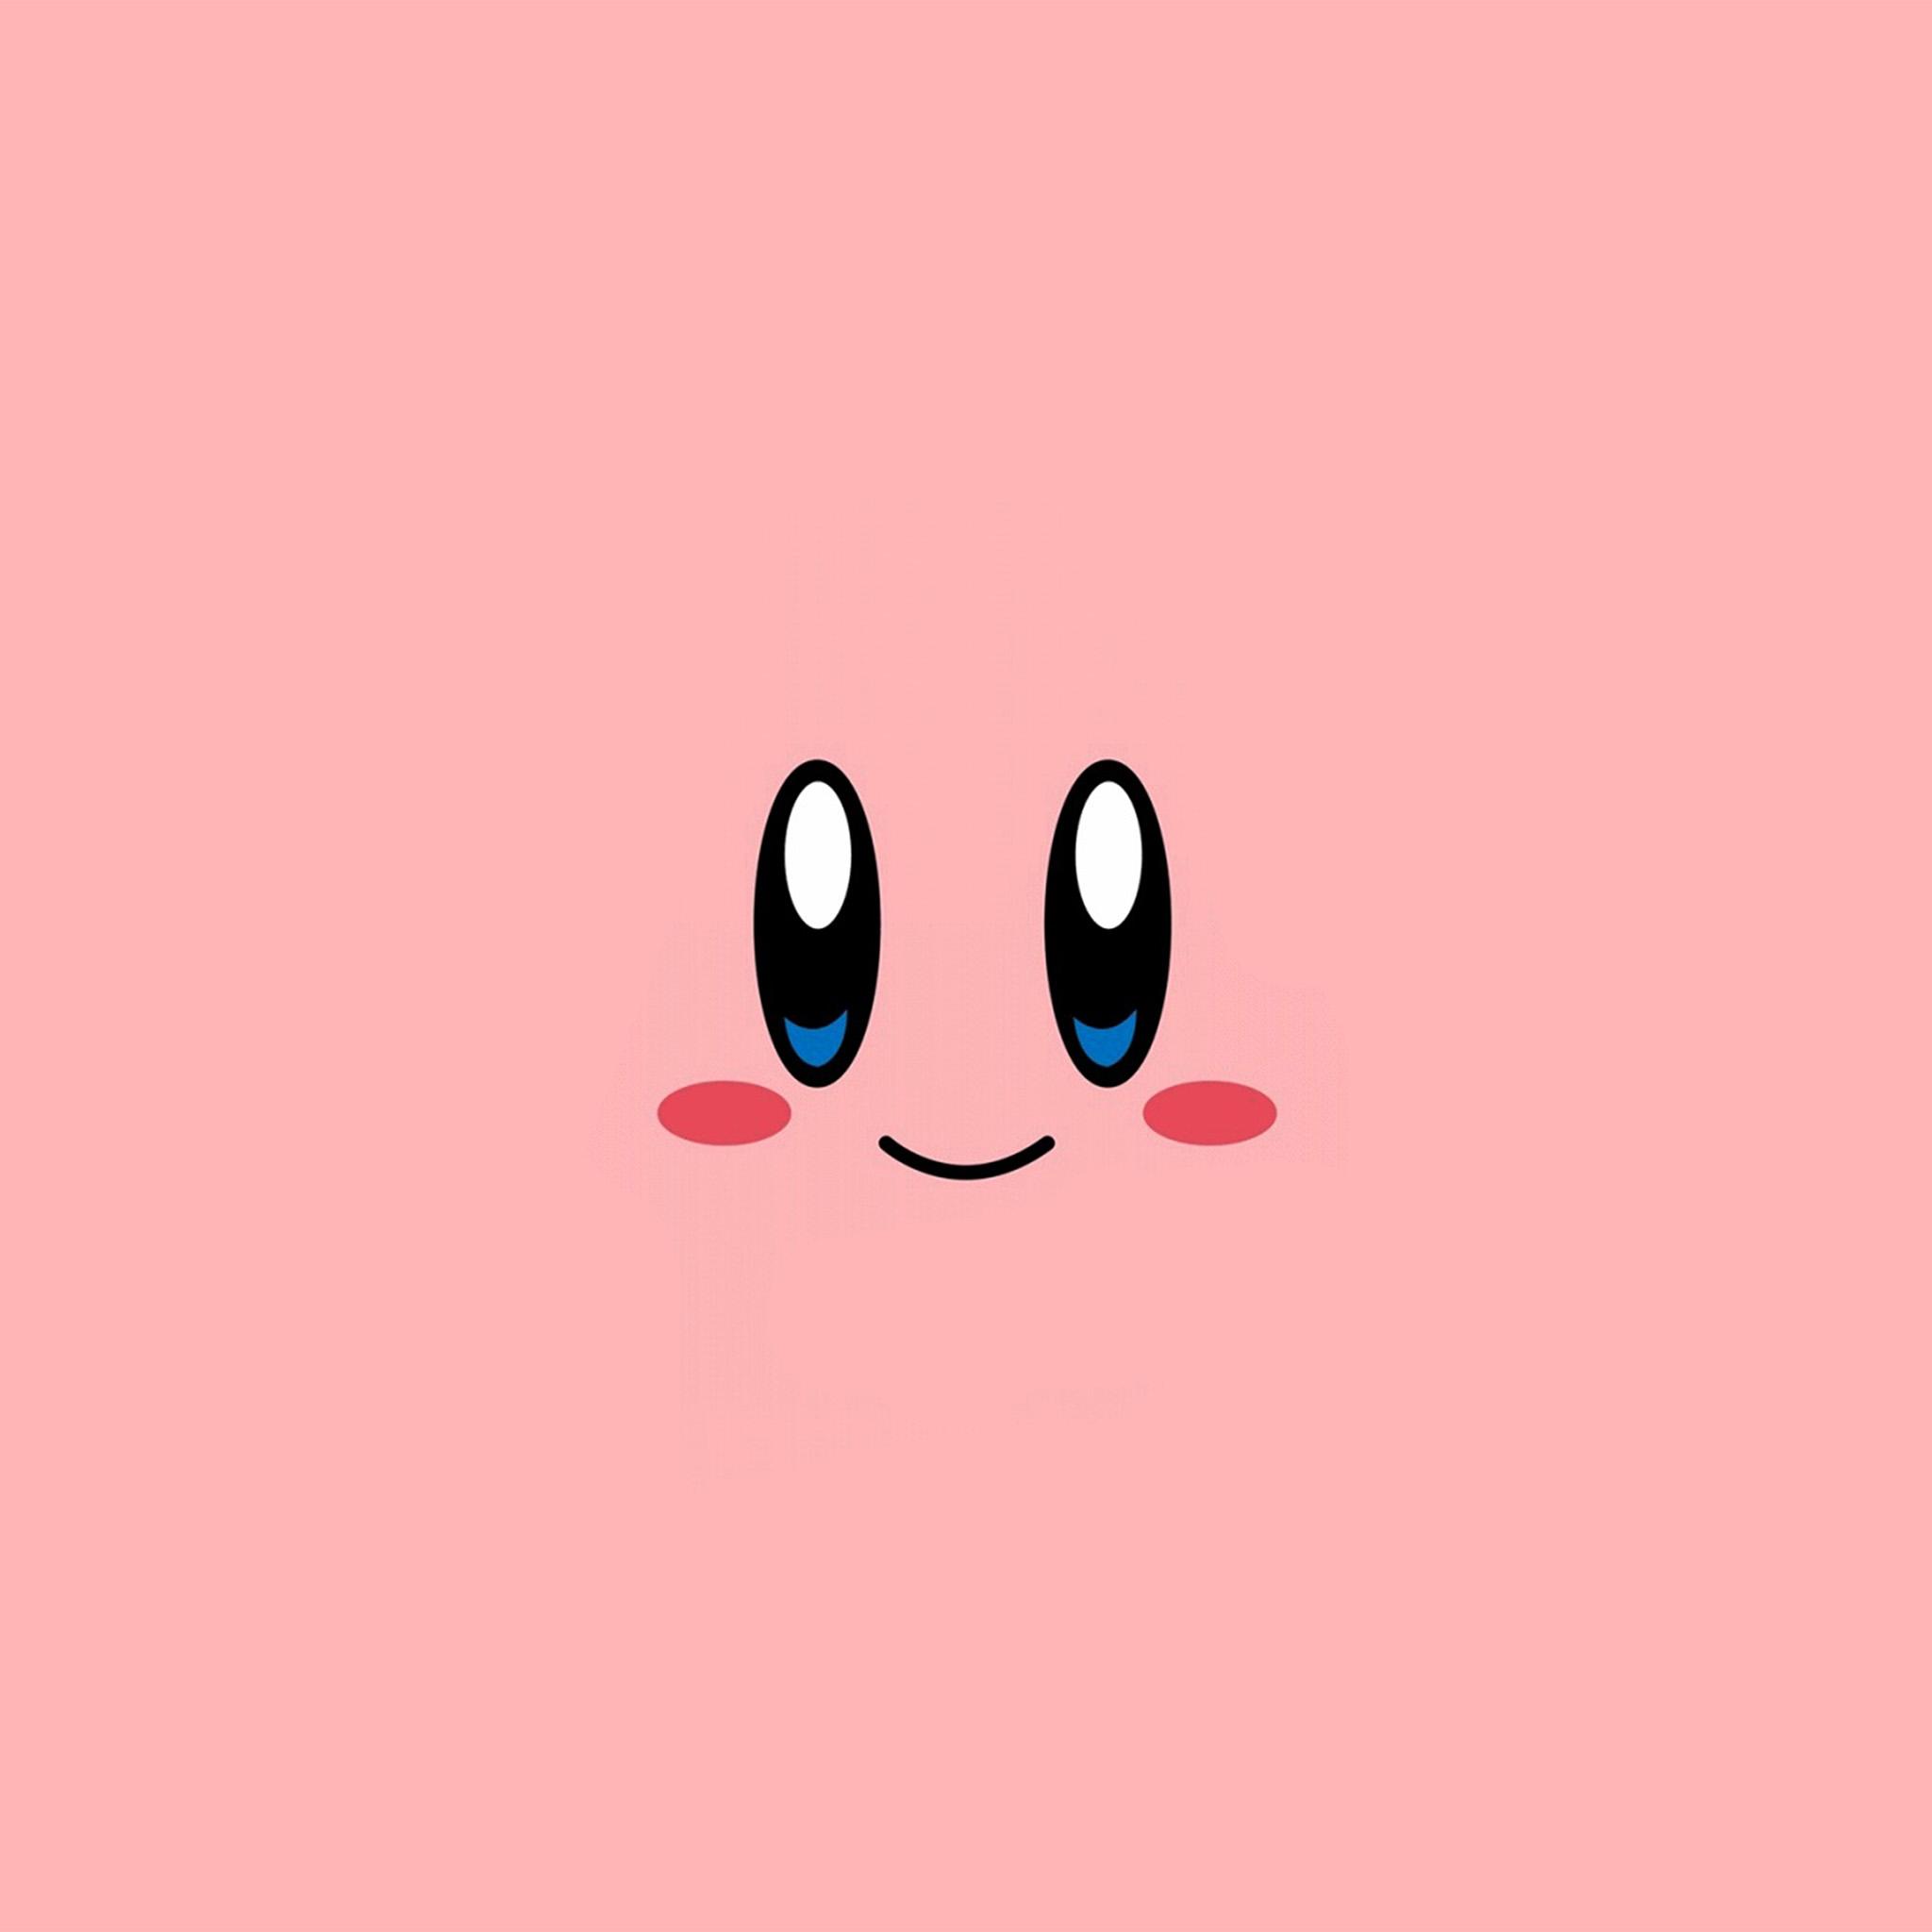 Cute Pokemon Iphone Wallpaper Az54 Kirby Pink Face Cute Illustration Art Wallpaper